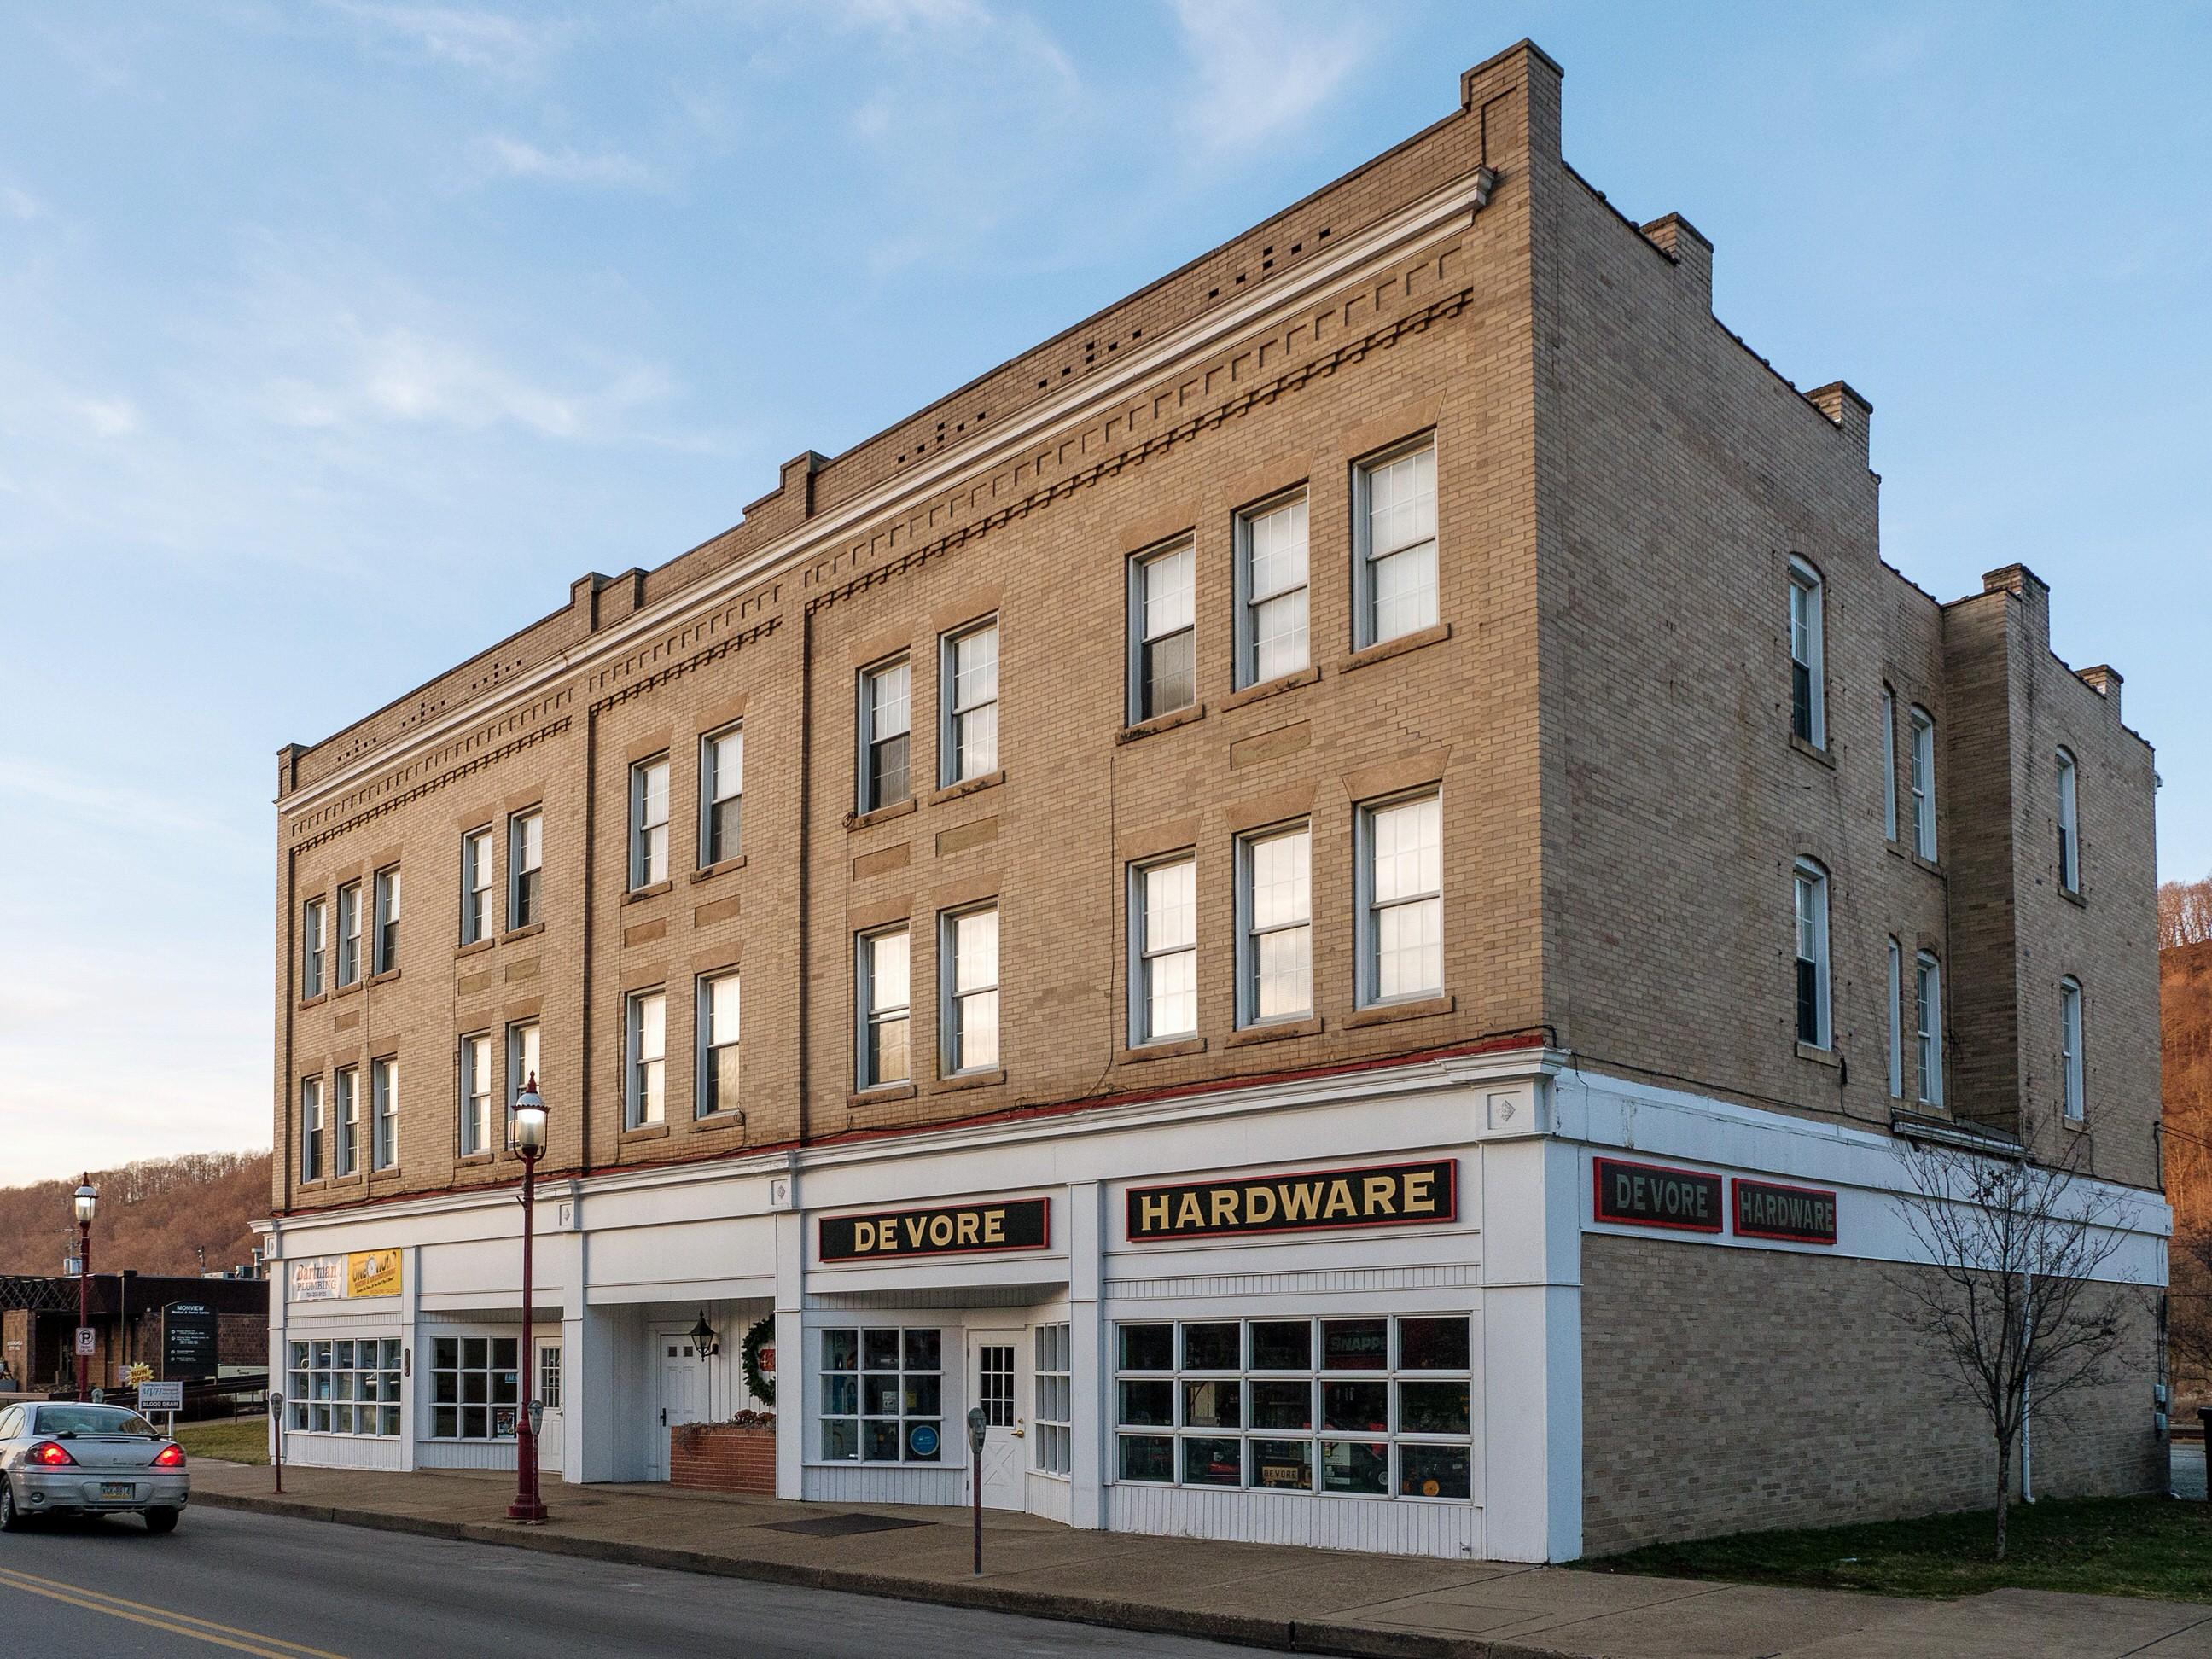 Photo of building at 437 - 443 West Main Street, Monongahela, Pa. 15063 along rt 88 and rt 136. Photo property of the Monongahela Main Street Program.